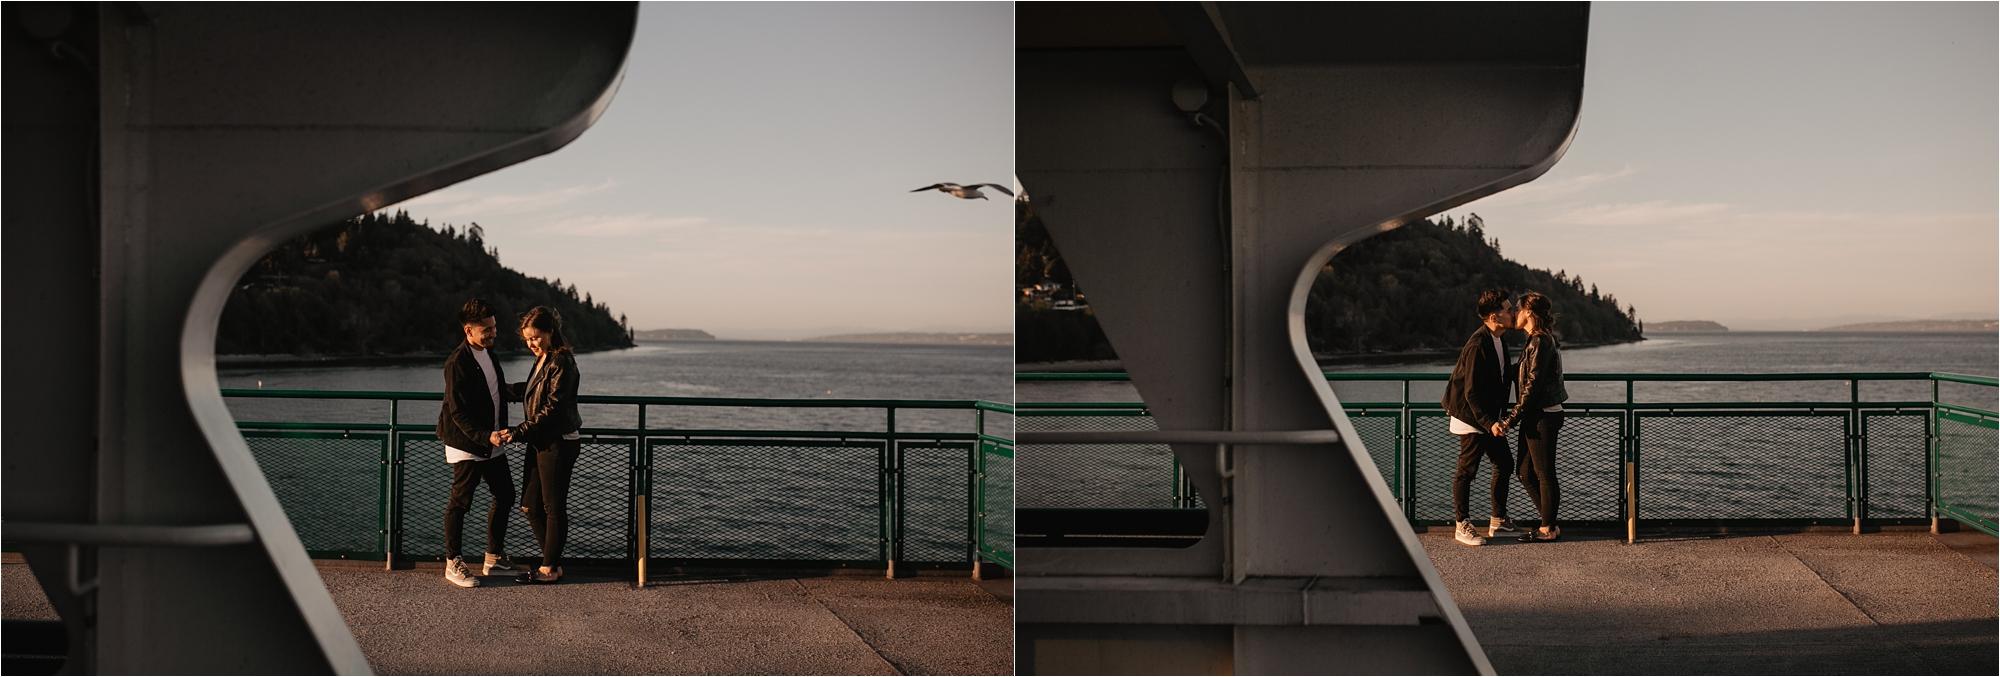 edmonds-kingston-ferry-washington-couple-photos_0057.jpg